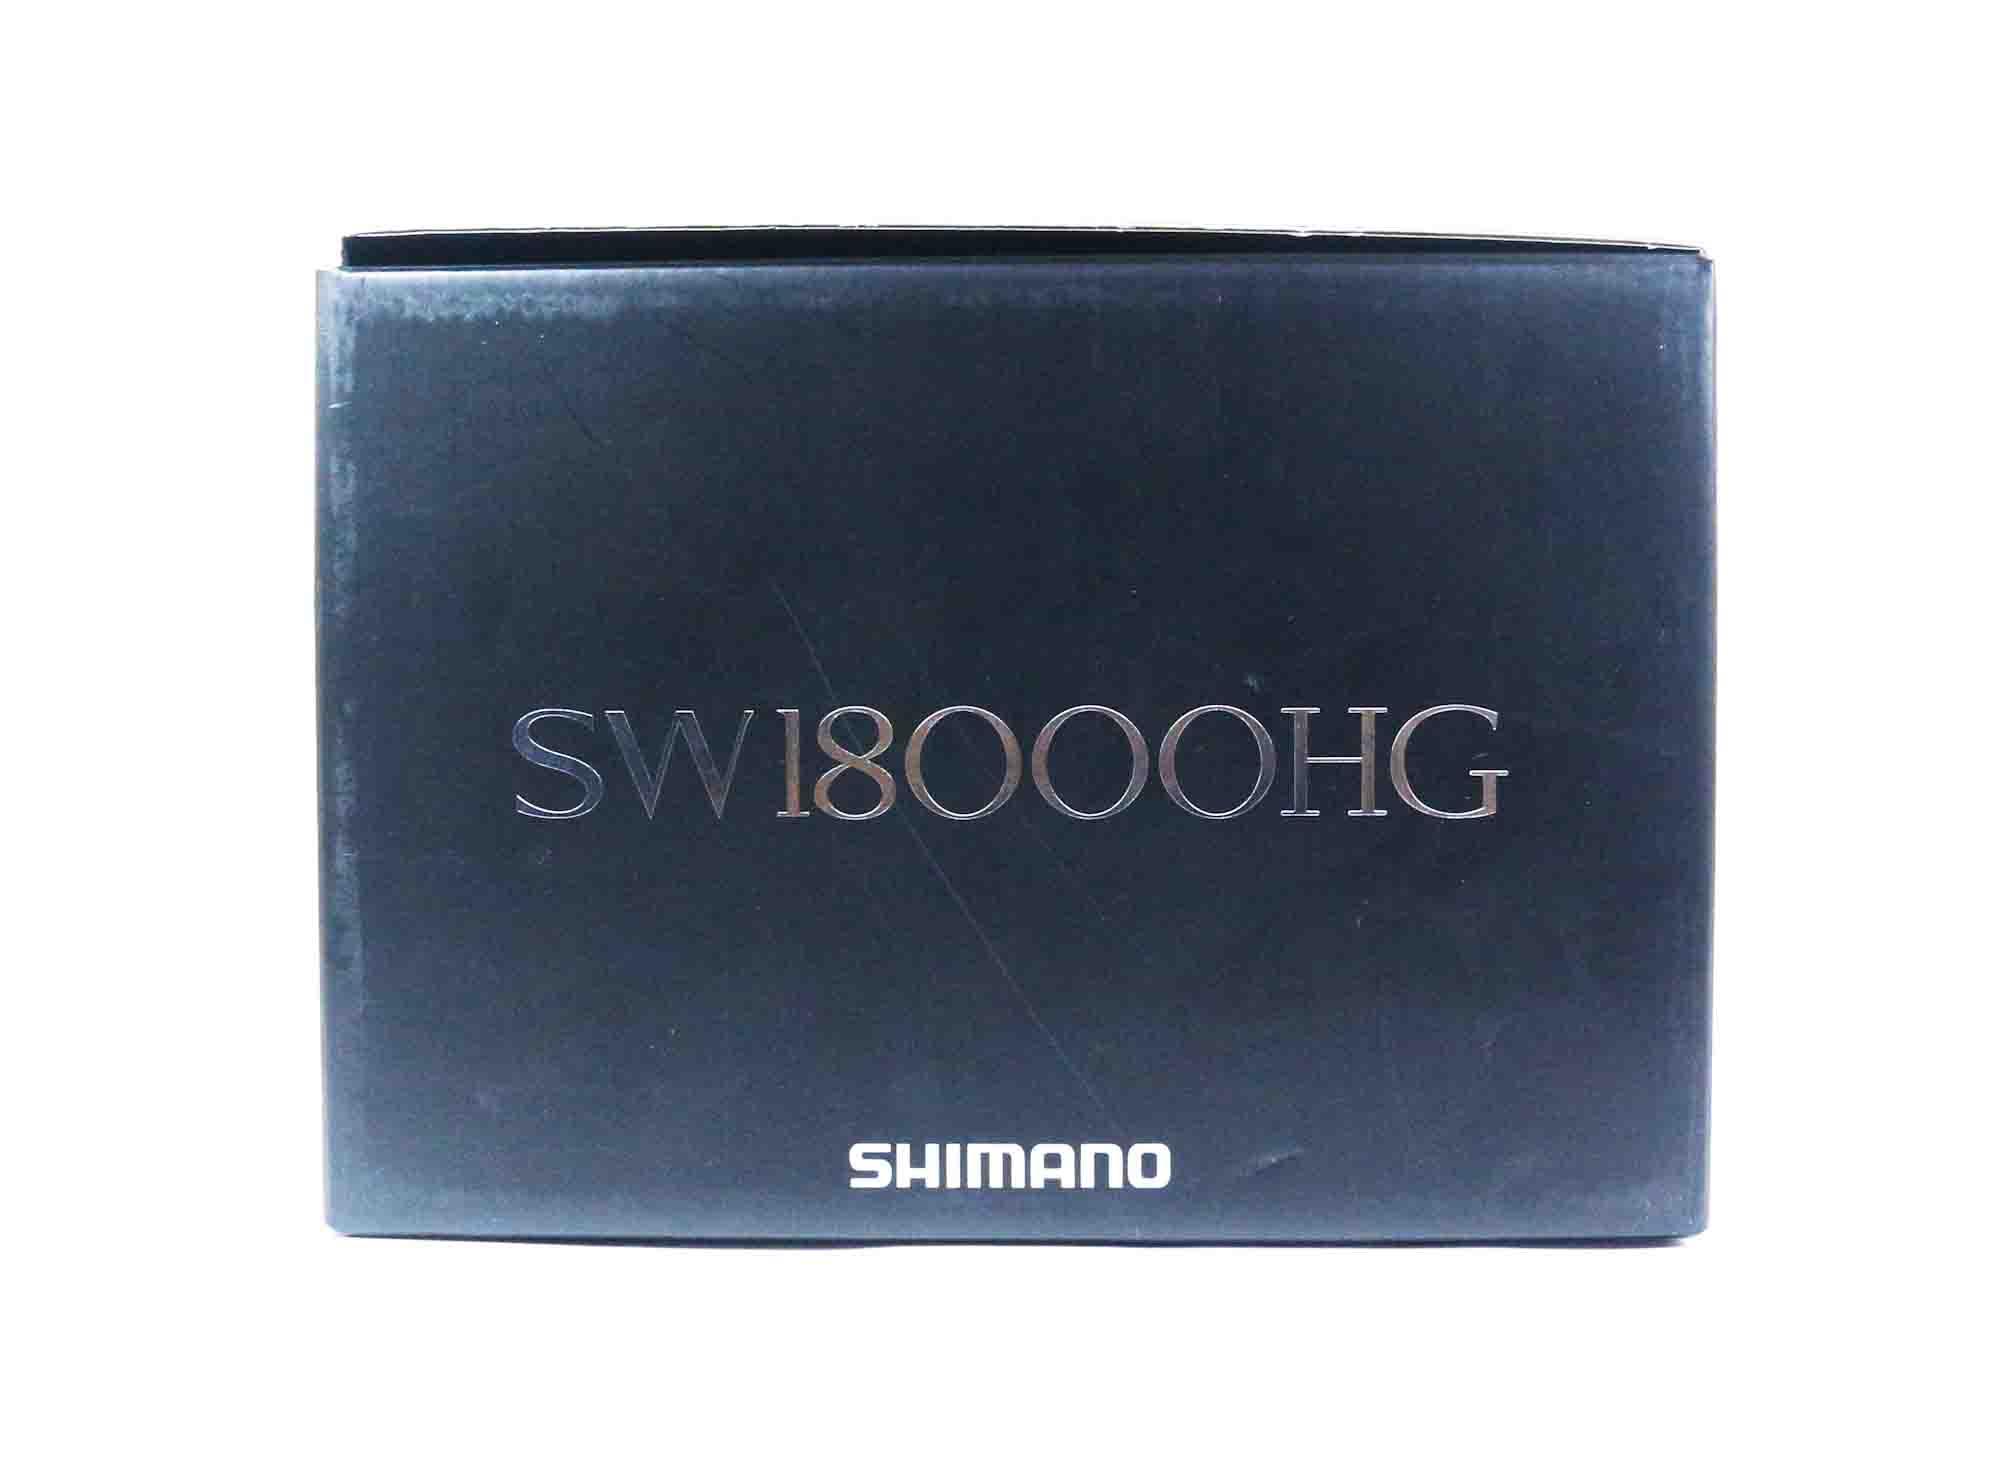 Shimano Reel Spinning Stella STLSW18000HGC SW 18000 HG (2217)